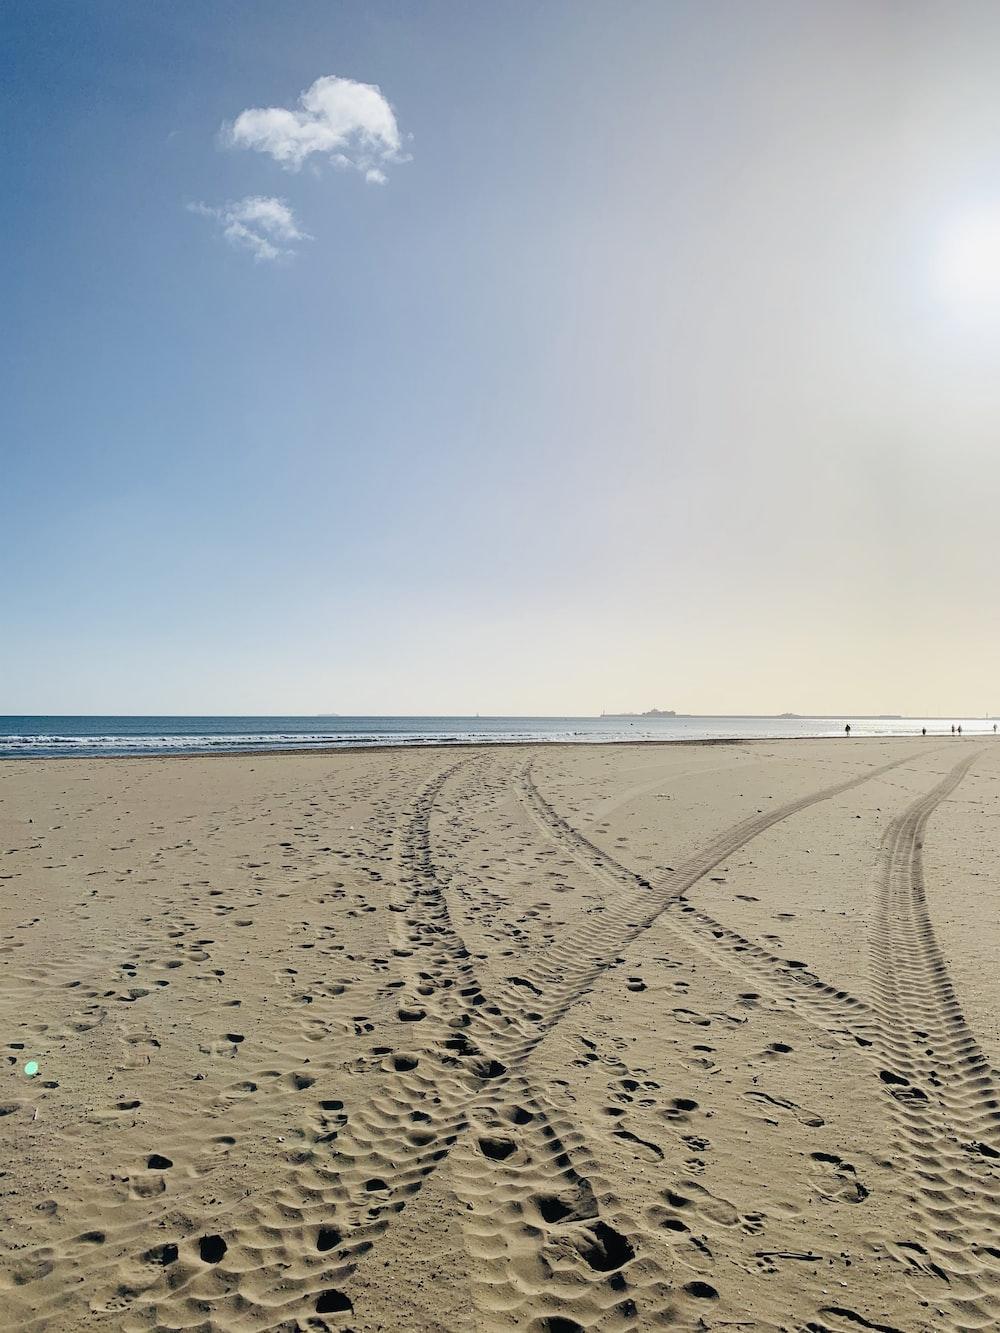 vehicle wheel mark on sand during daytime